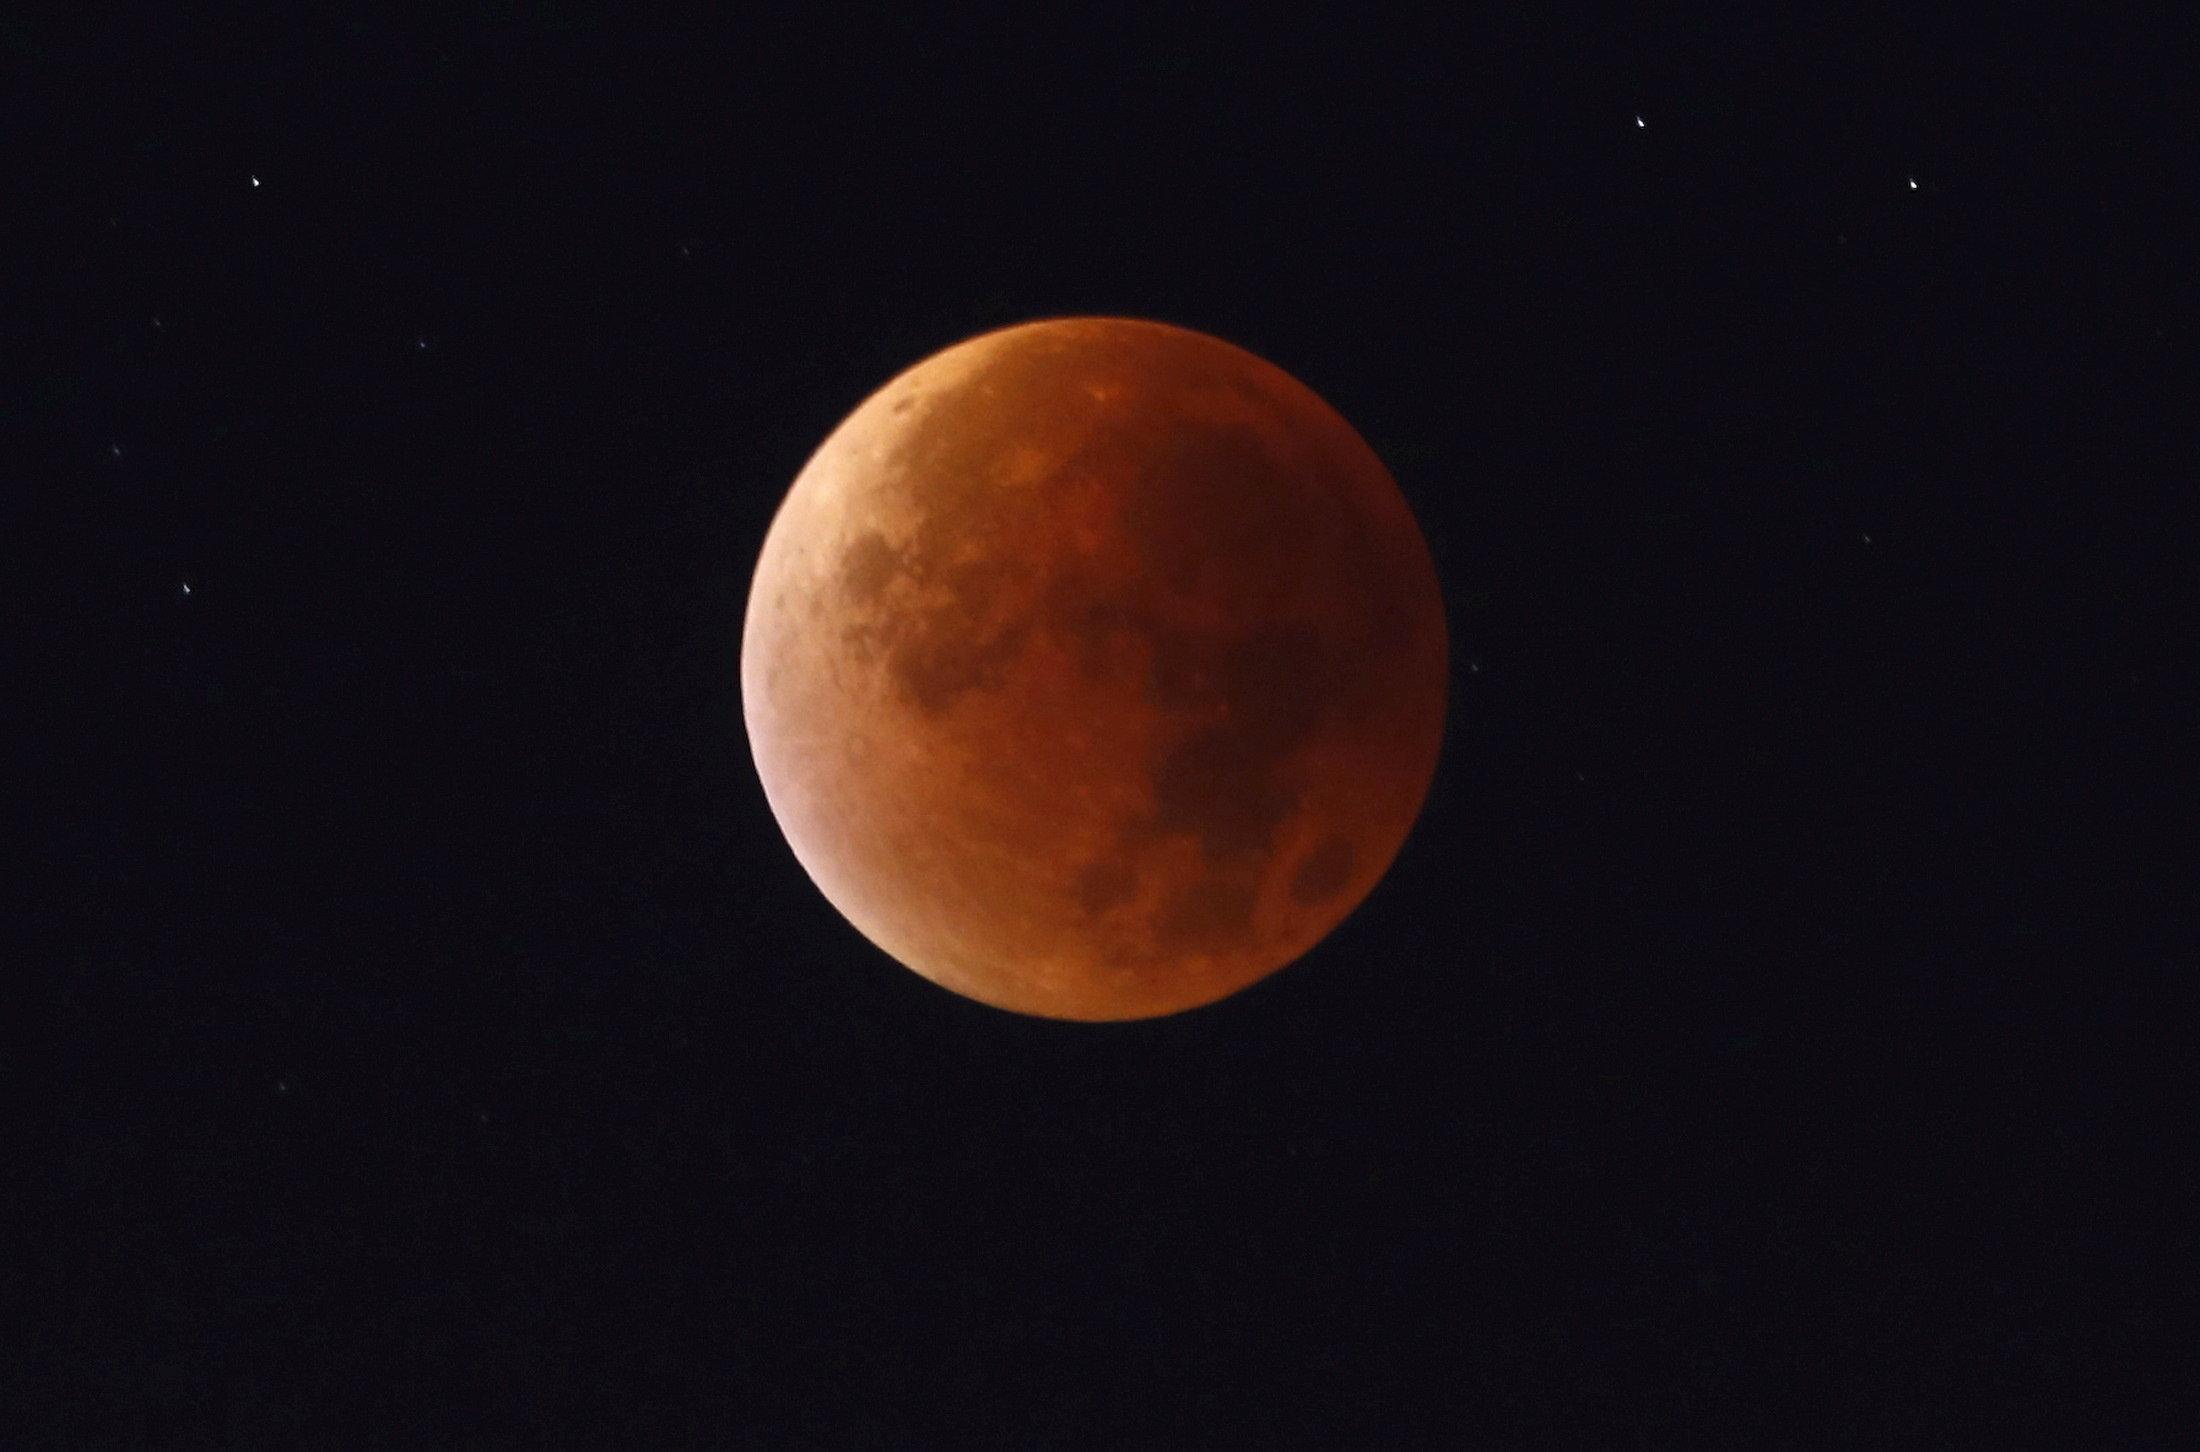 Blood moon brings longest lunar eclipse